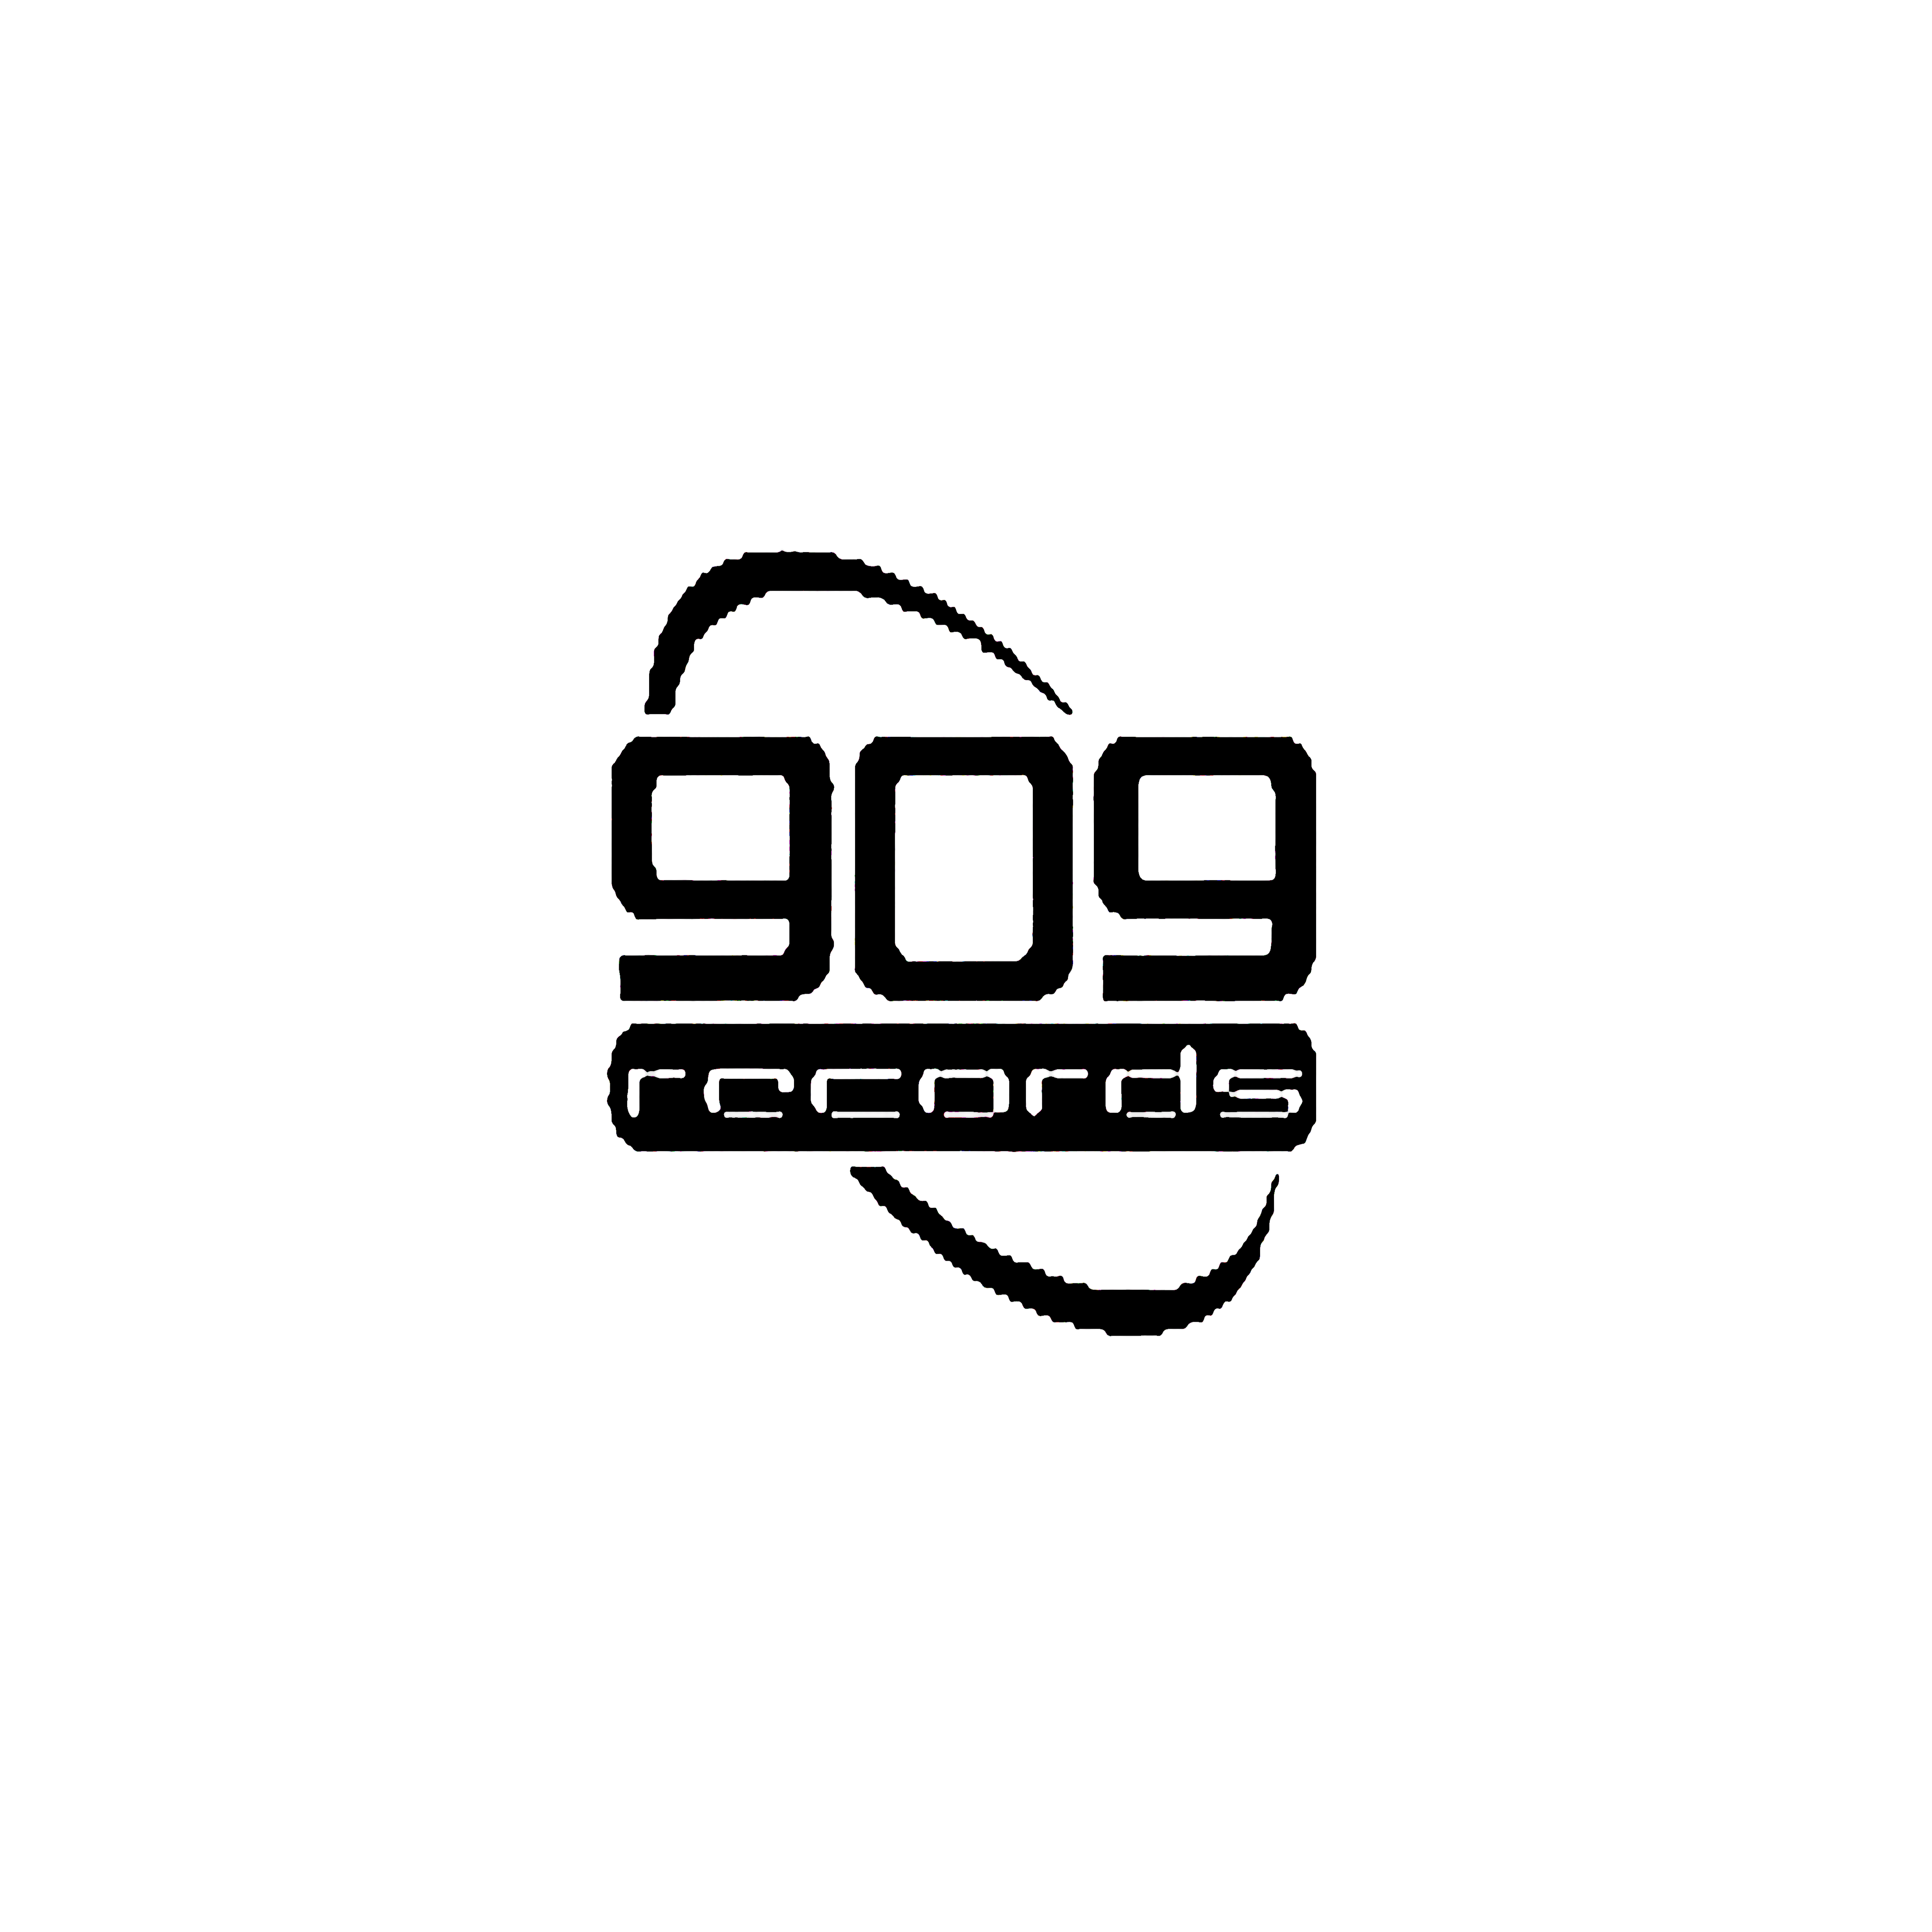 909 Records